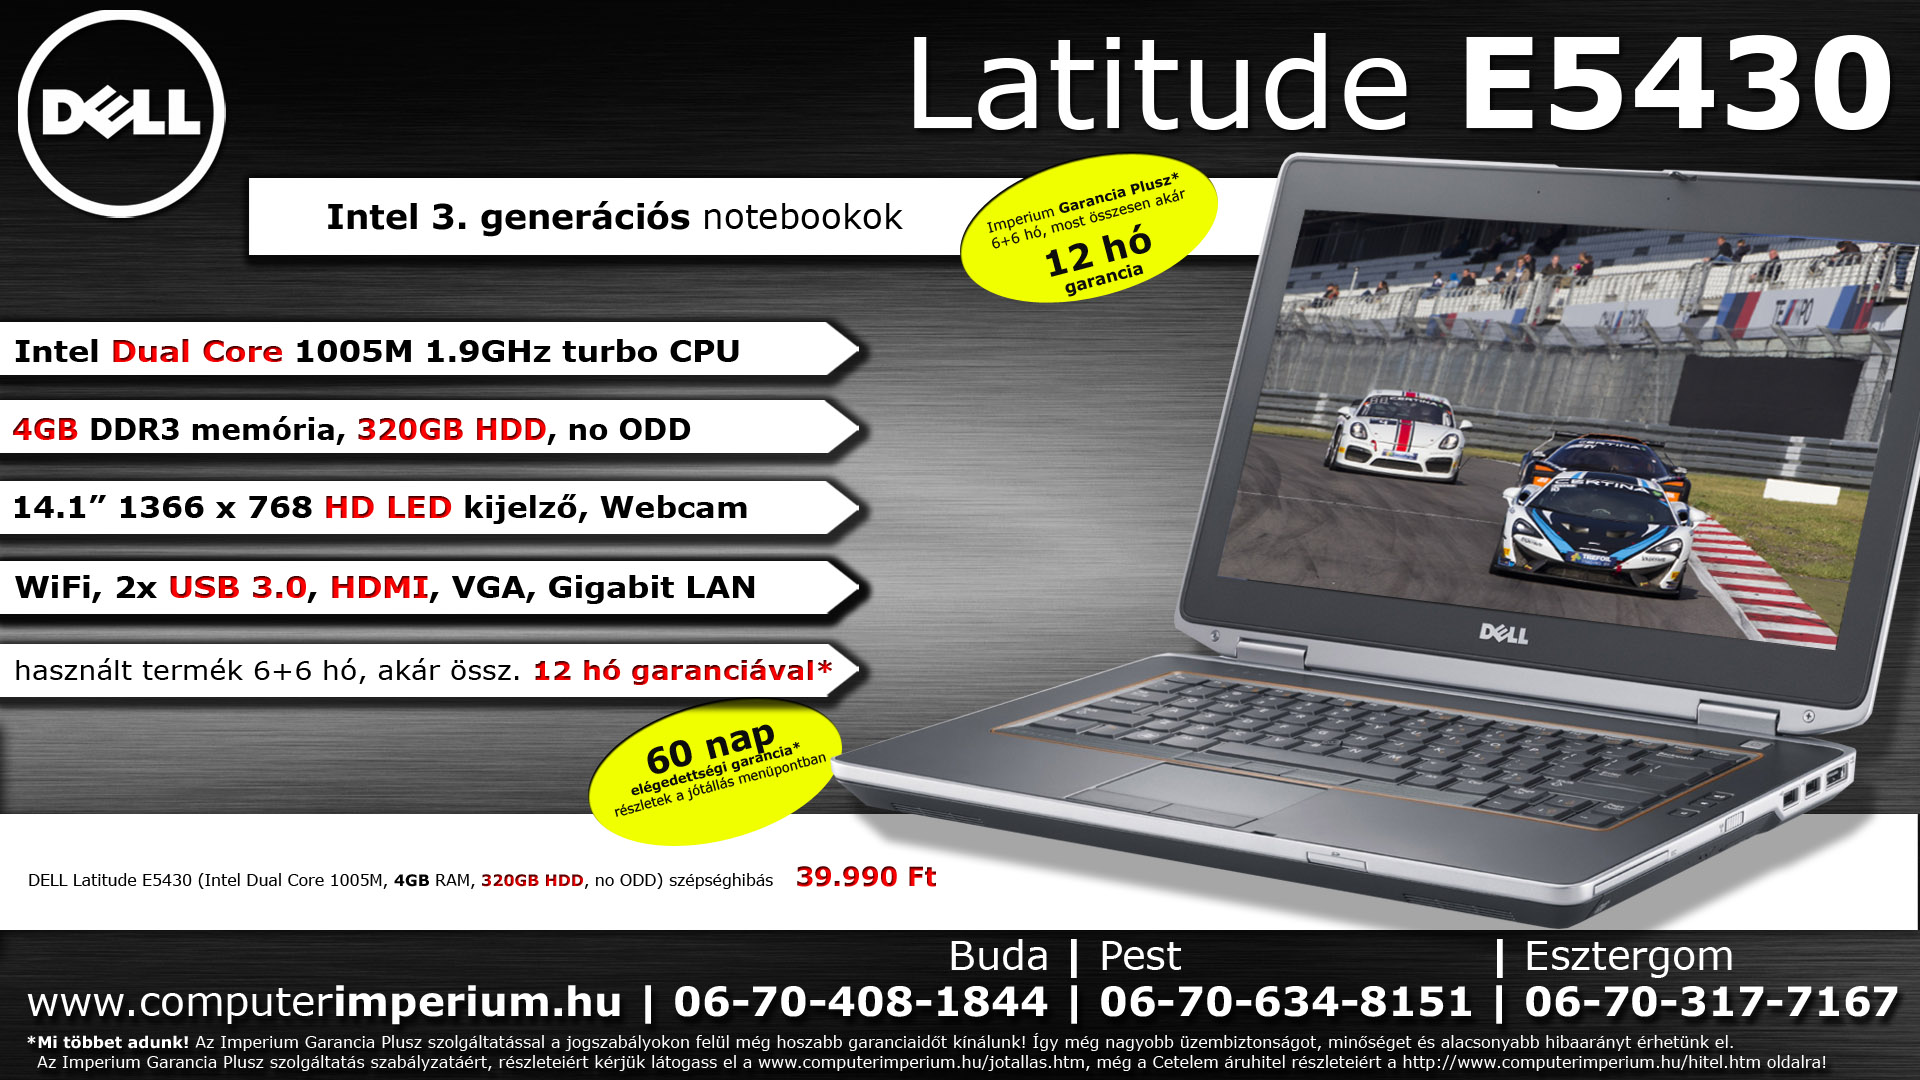 7f62c55bc266 DELL Latitude E5430 (i5-3340M, 4GB RAM, 120GB SSD, DVD-RW, 14.1